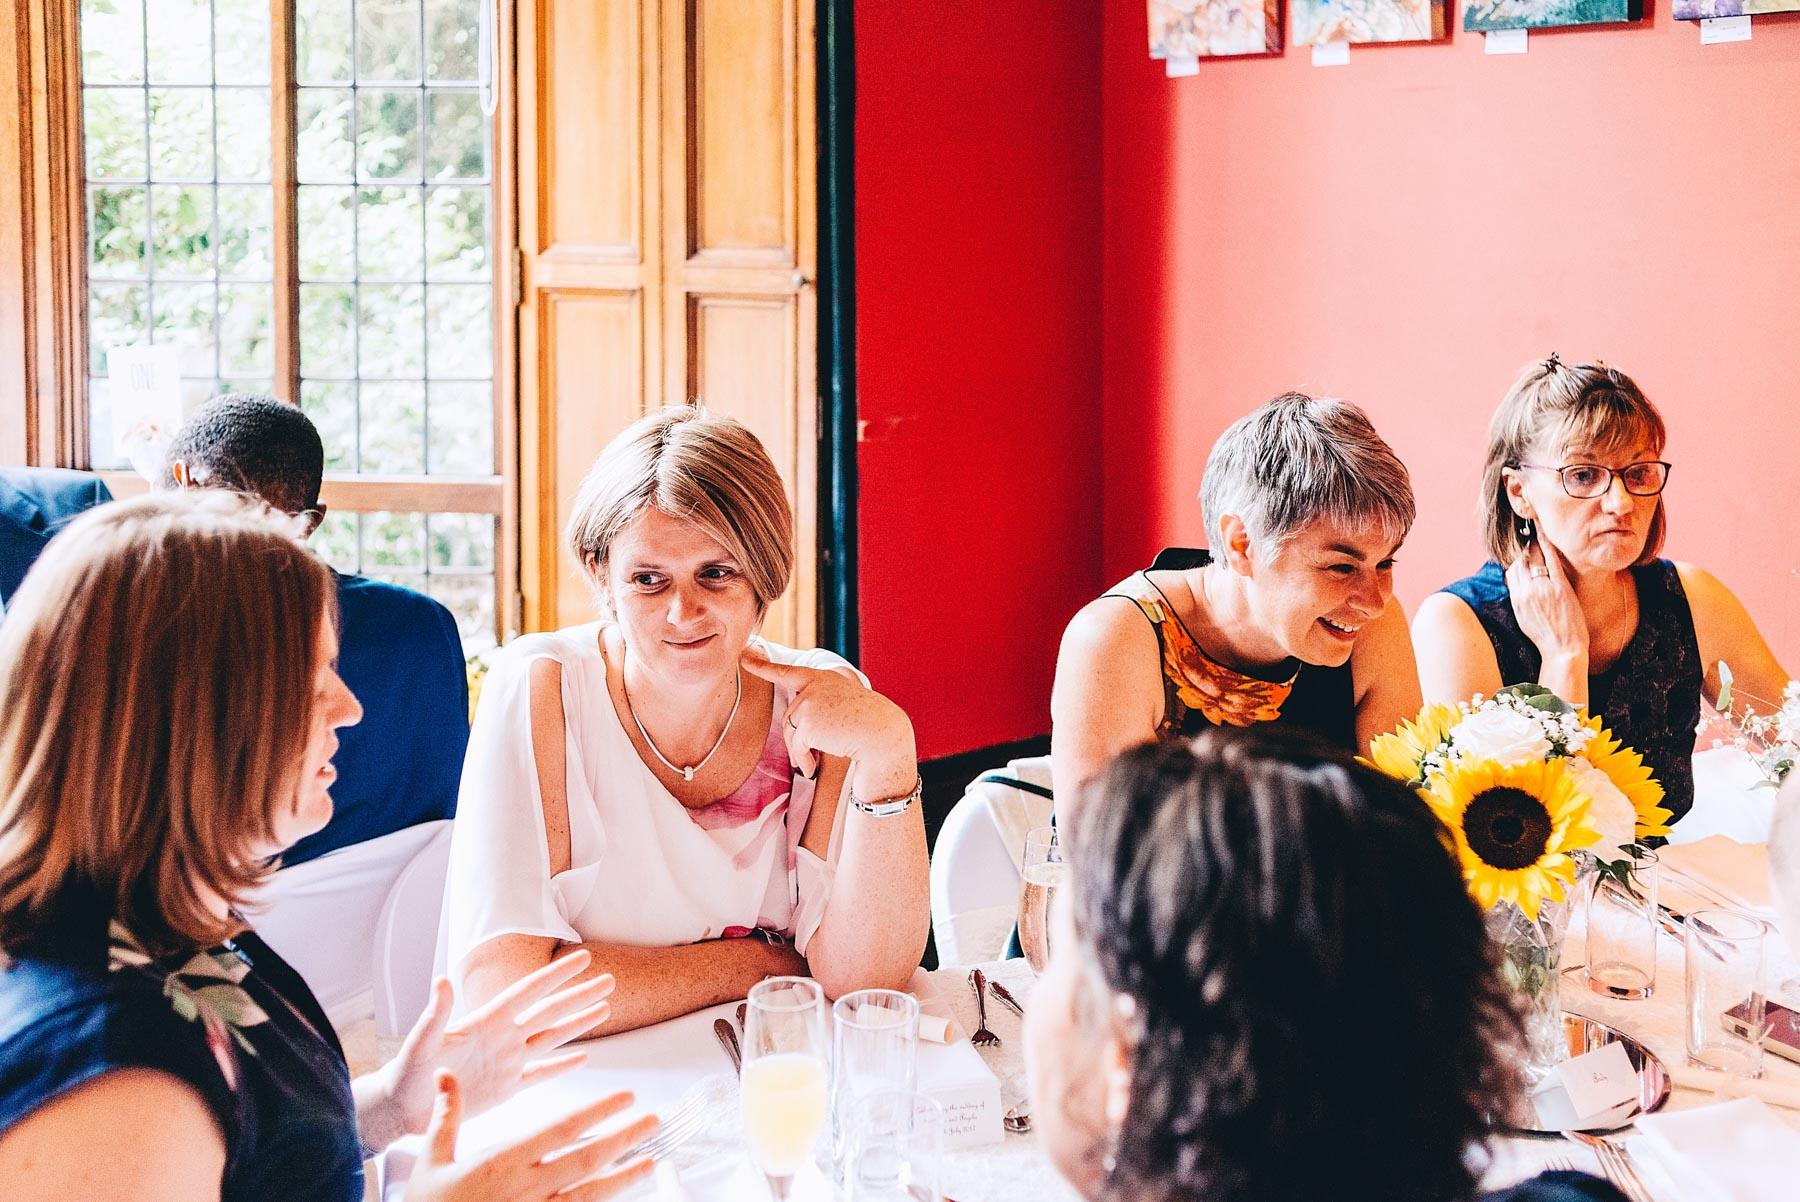 Wedding guests talk